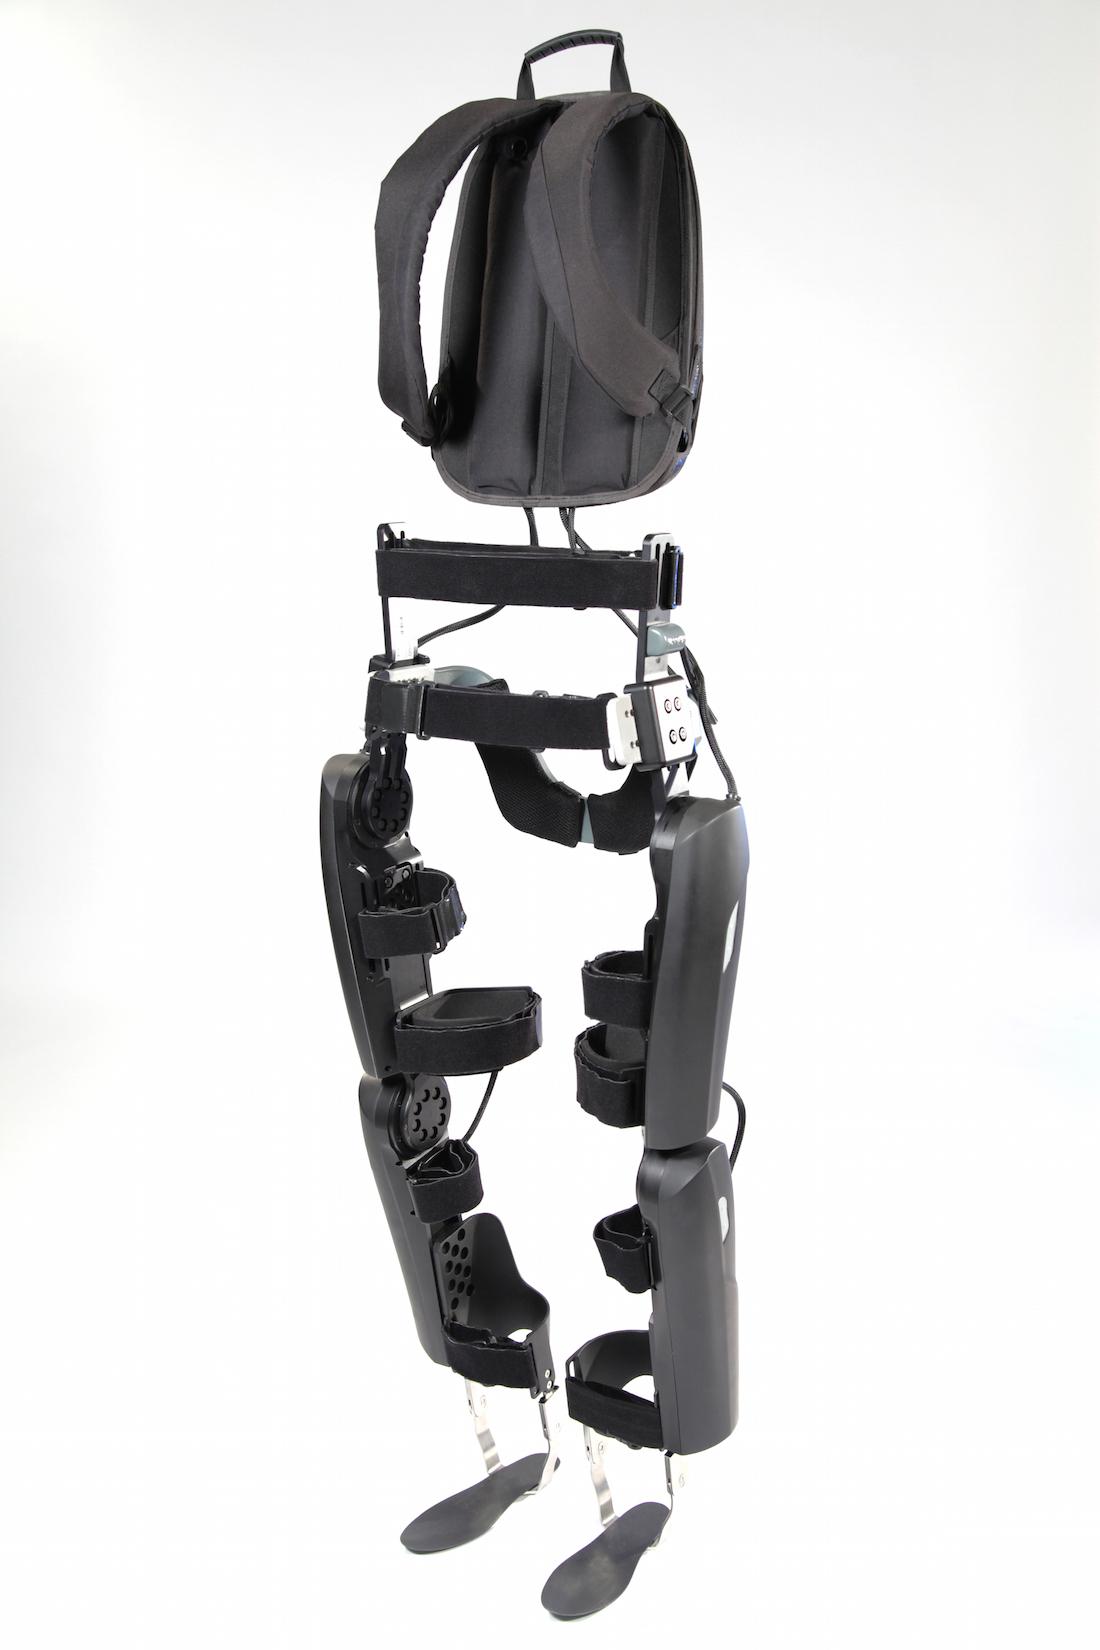 ReWalk Exoskelet